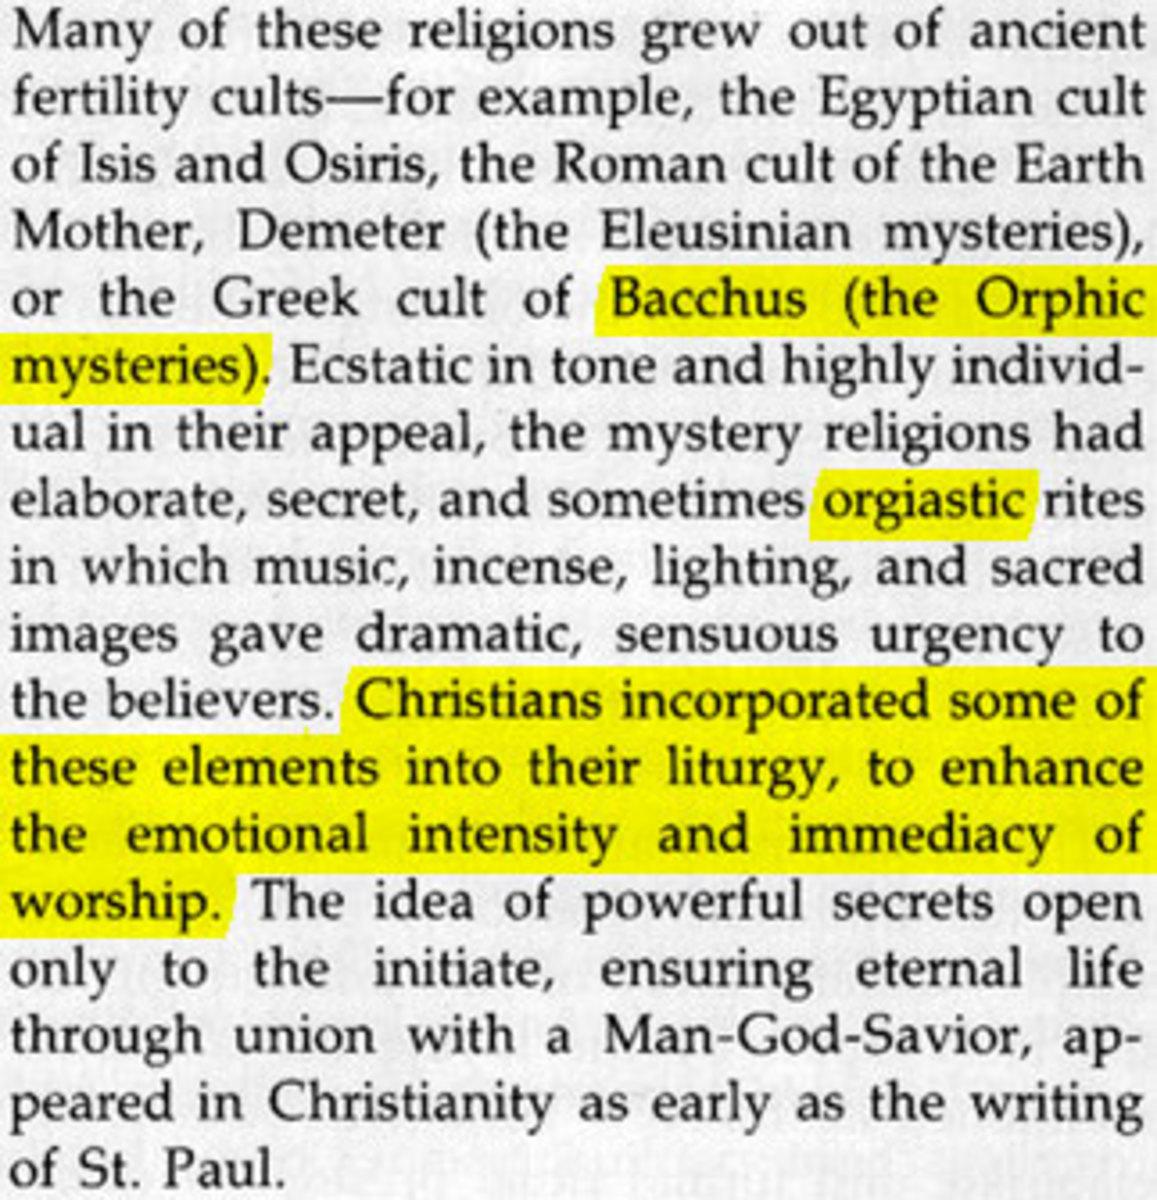 the-emrgrnt-church-apostasy